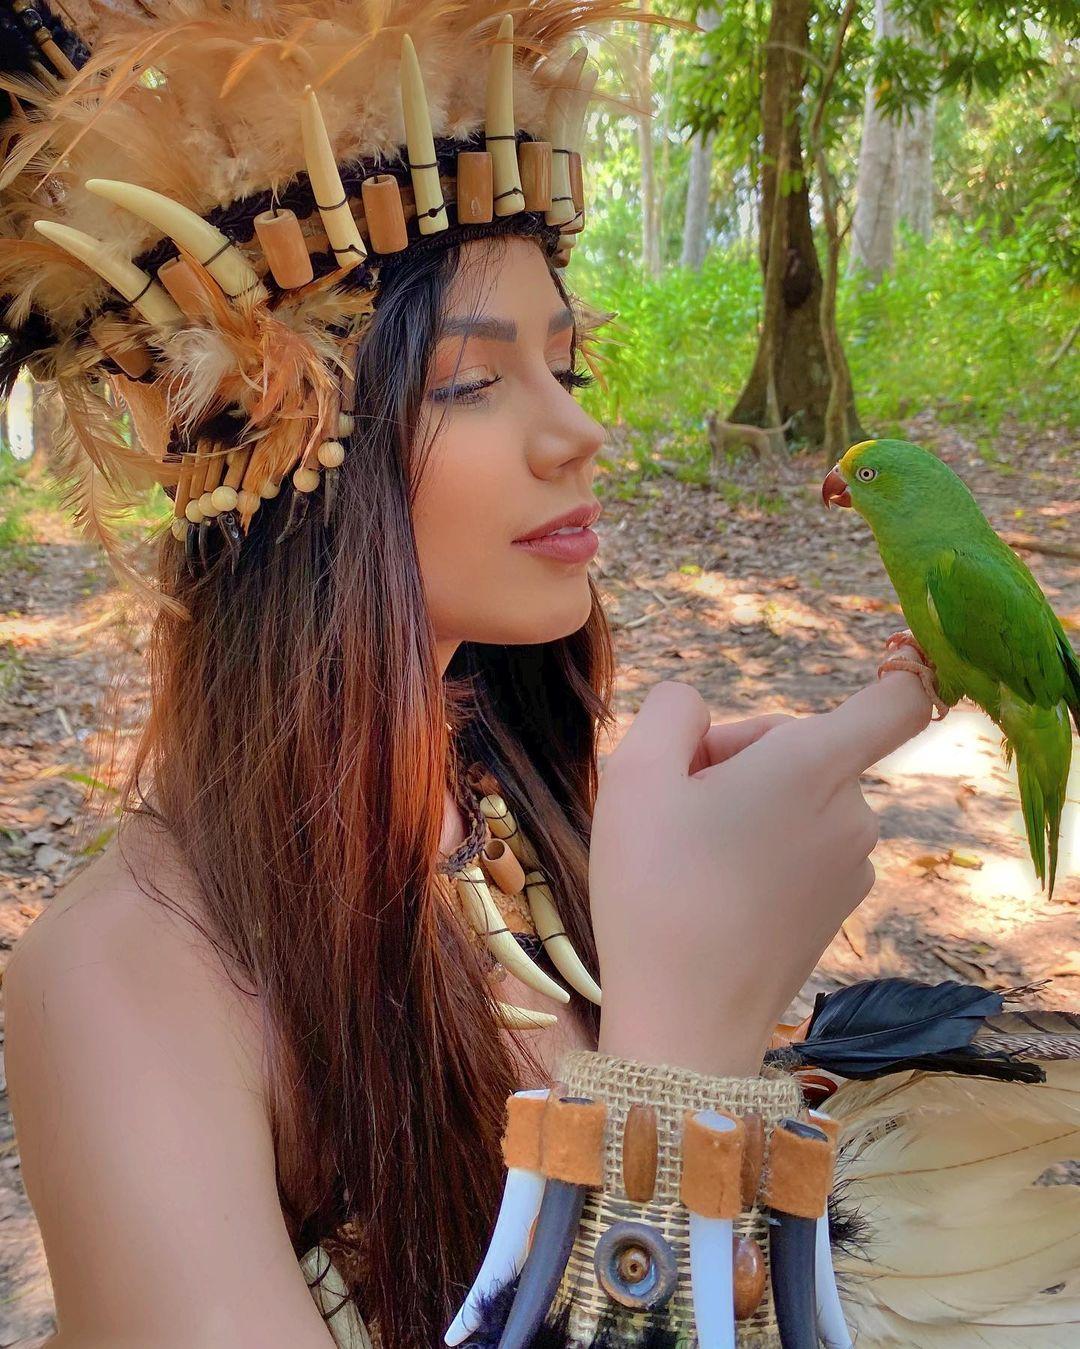 thais bergamini, miss terra brasil 2020. Thaisb15